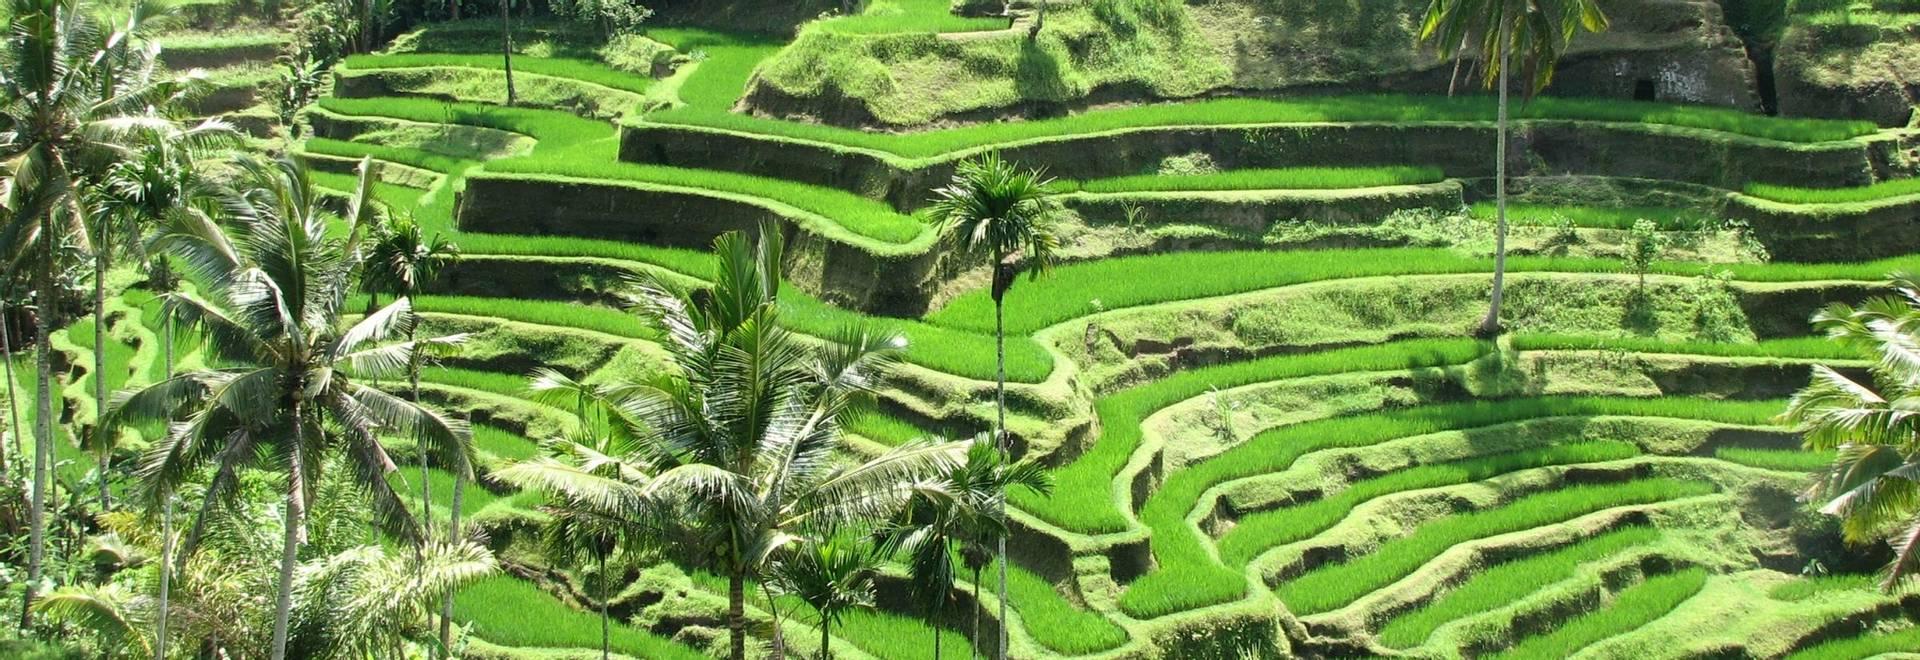 rice field bali.jpg